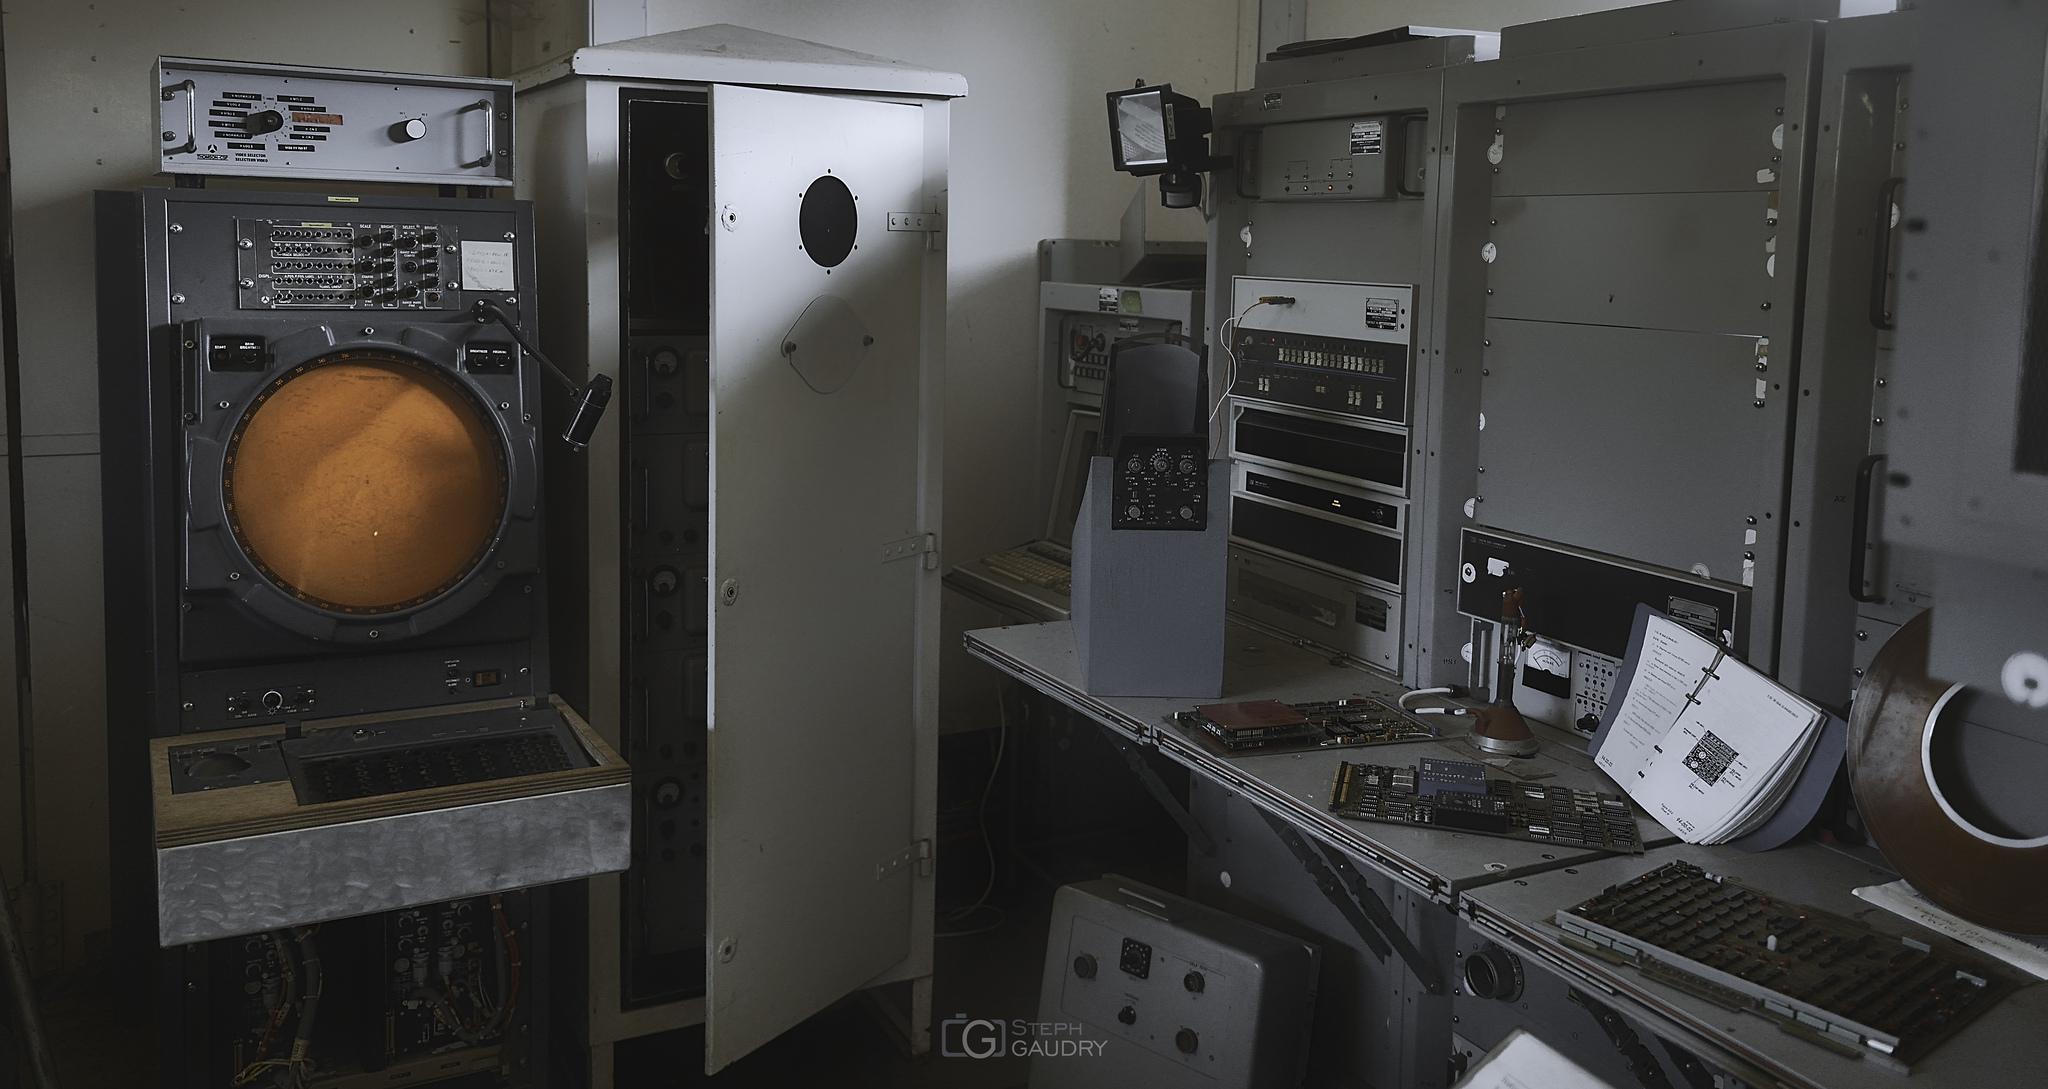 Old military radar for the air traffic control [Cliquez pour lancer le diaporama]